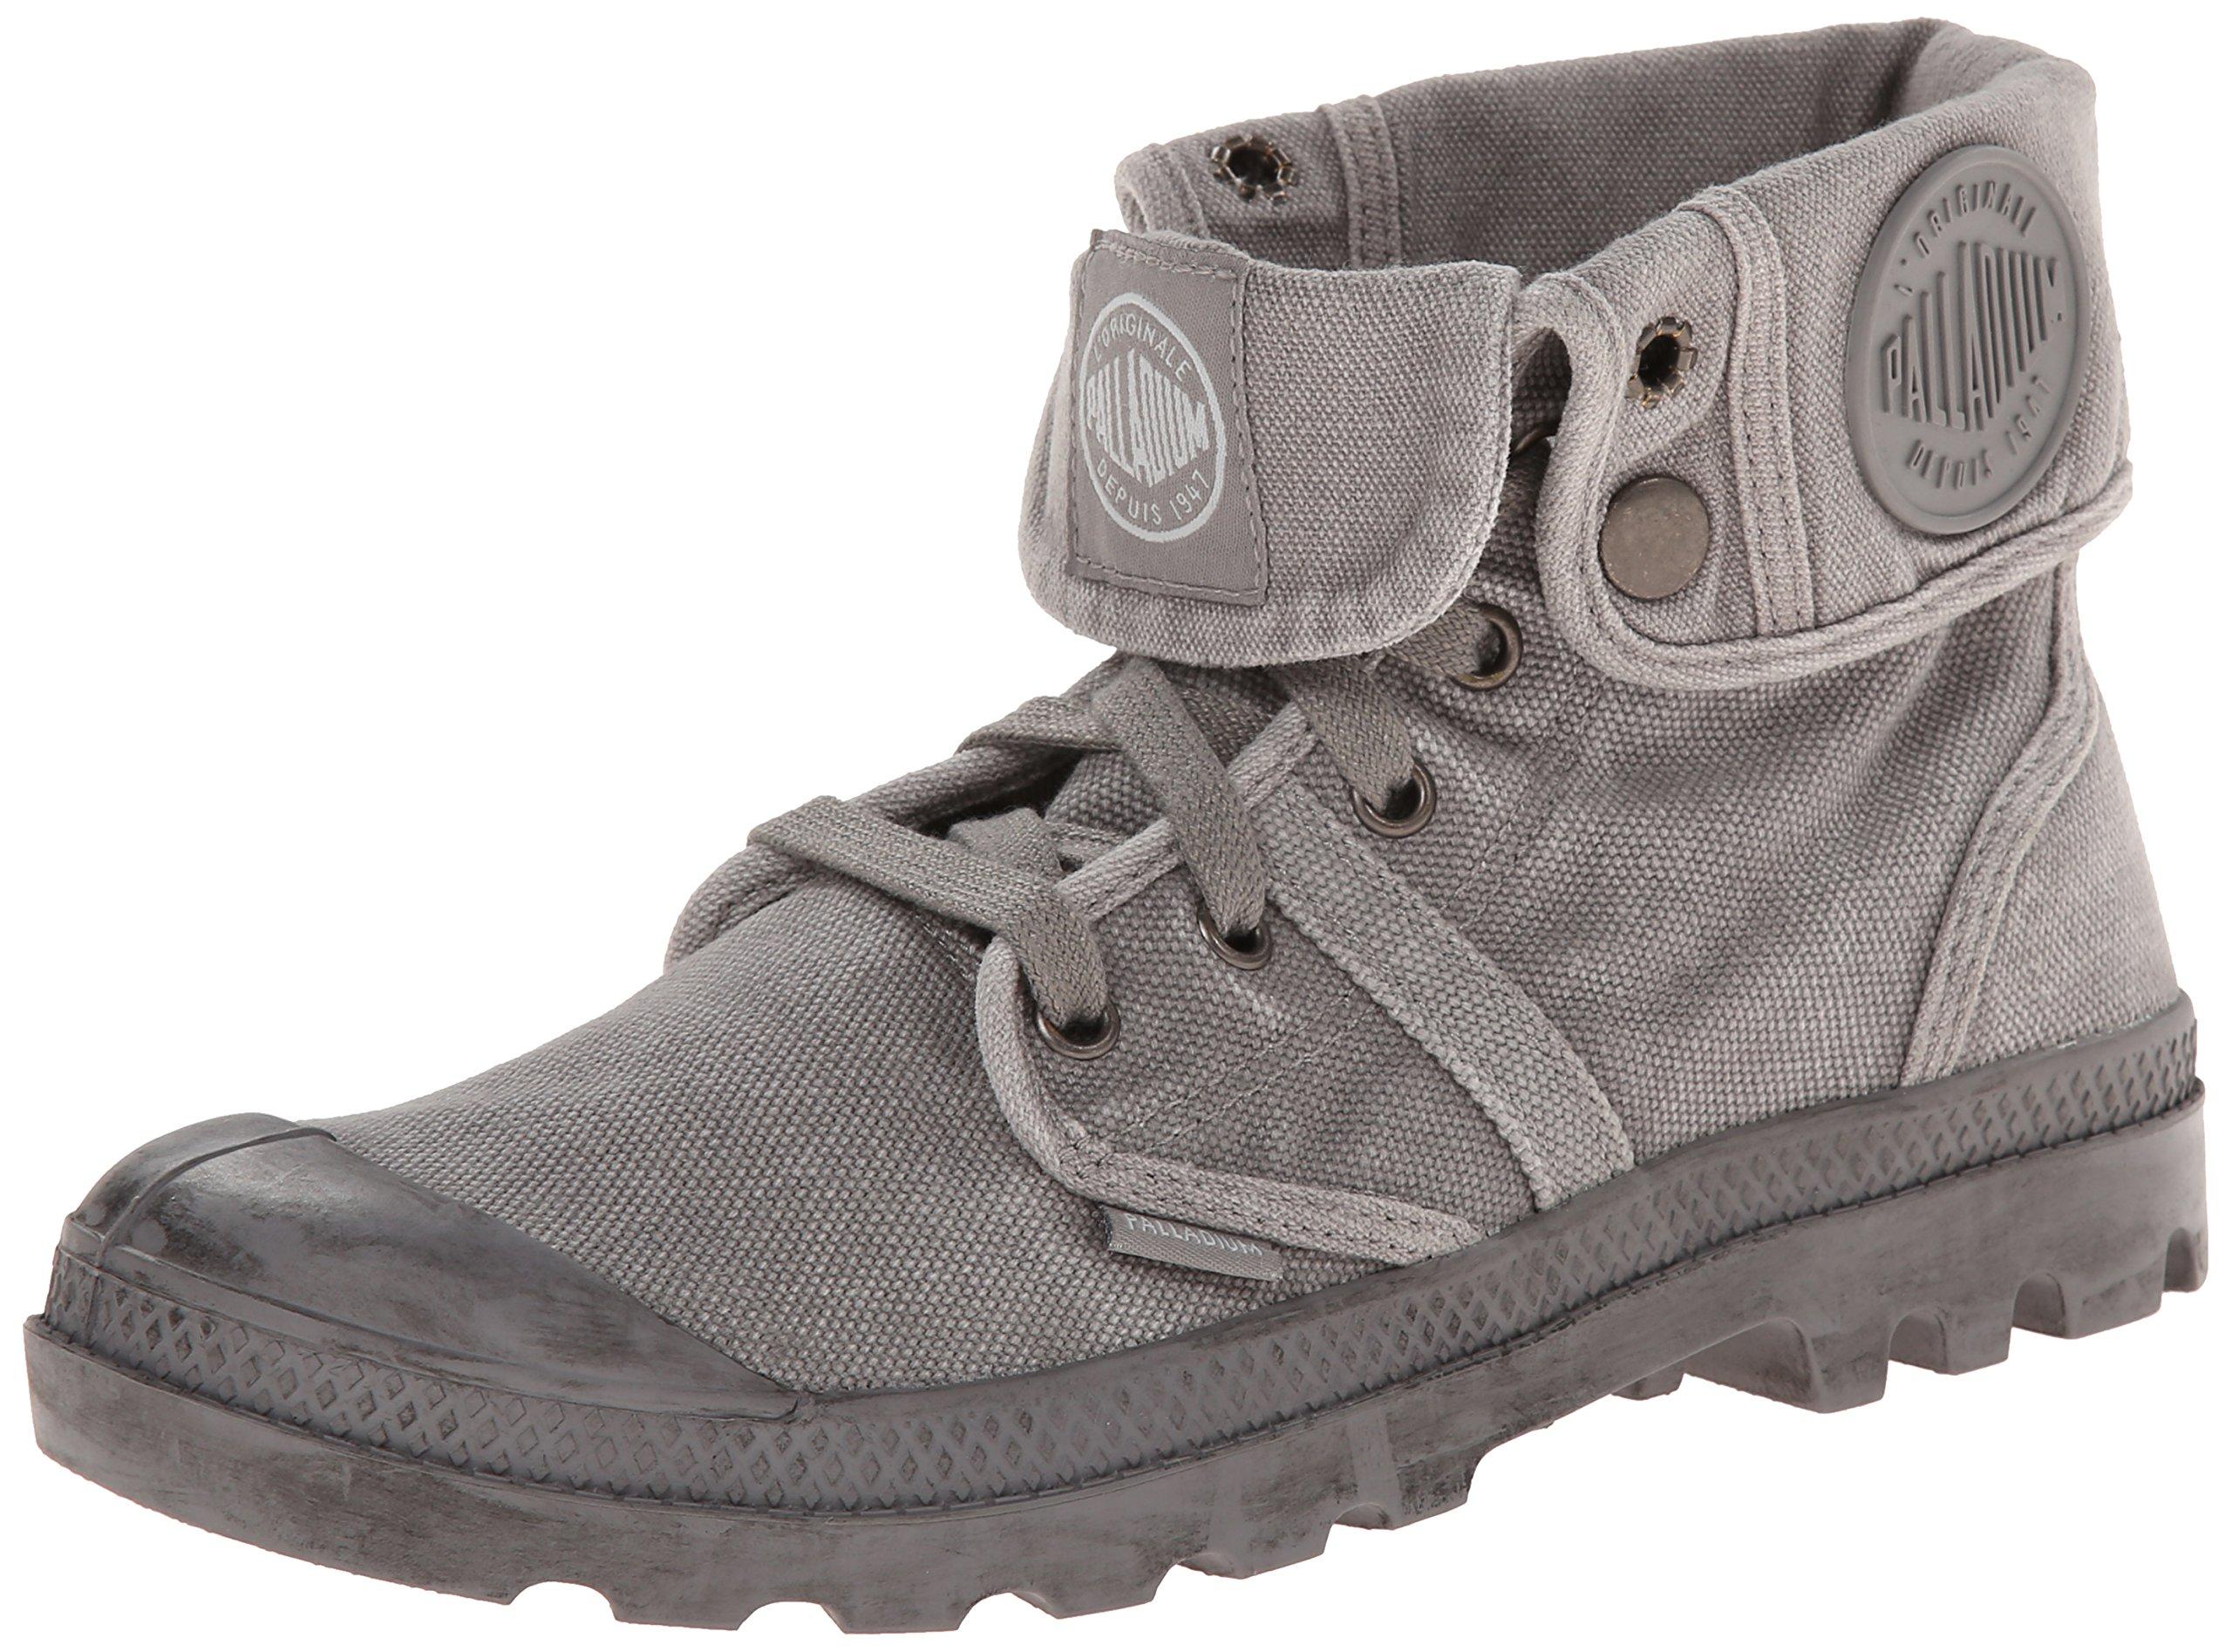 Palladium Women's Pallabrouse Baggy Chukka Boot - Titanium, 7.5 B(M) US